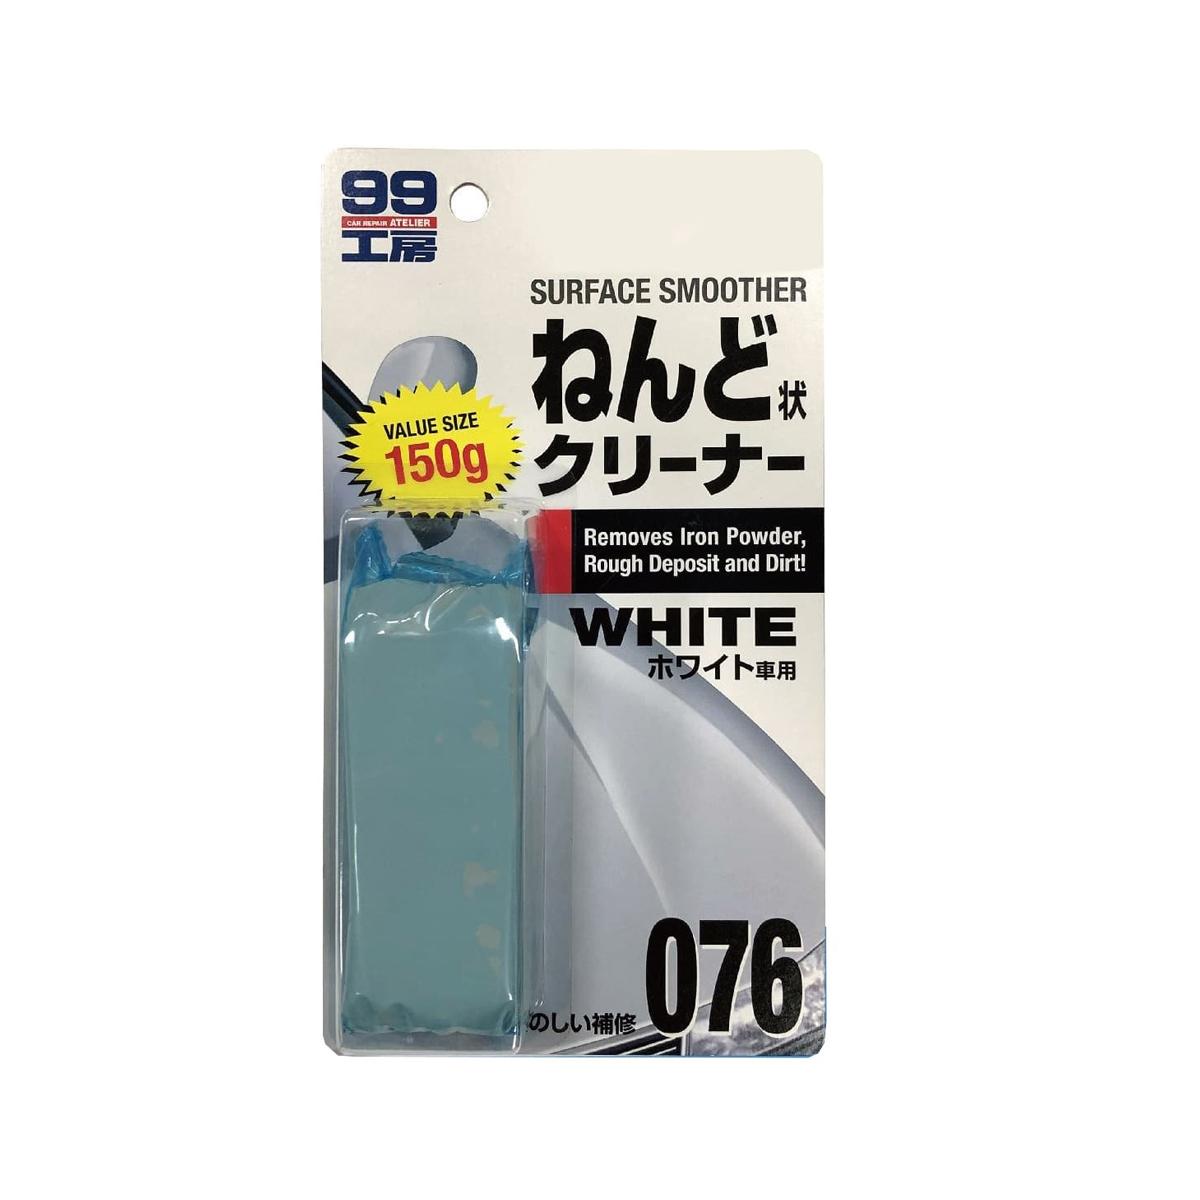 Clay Bar White Alta Abrasividade 150g (076) - Soft99